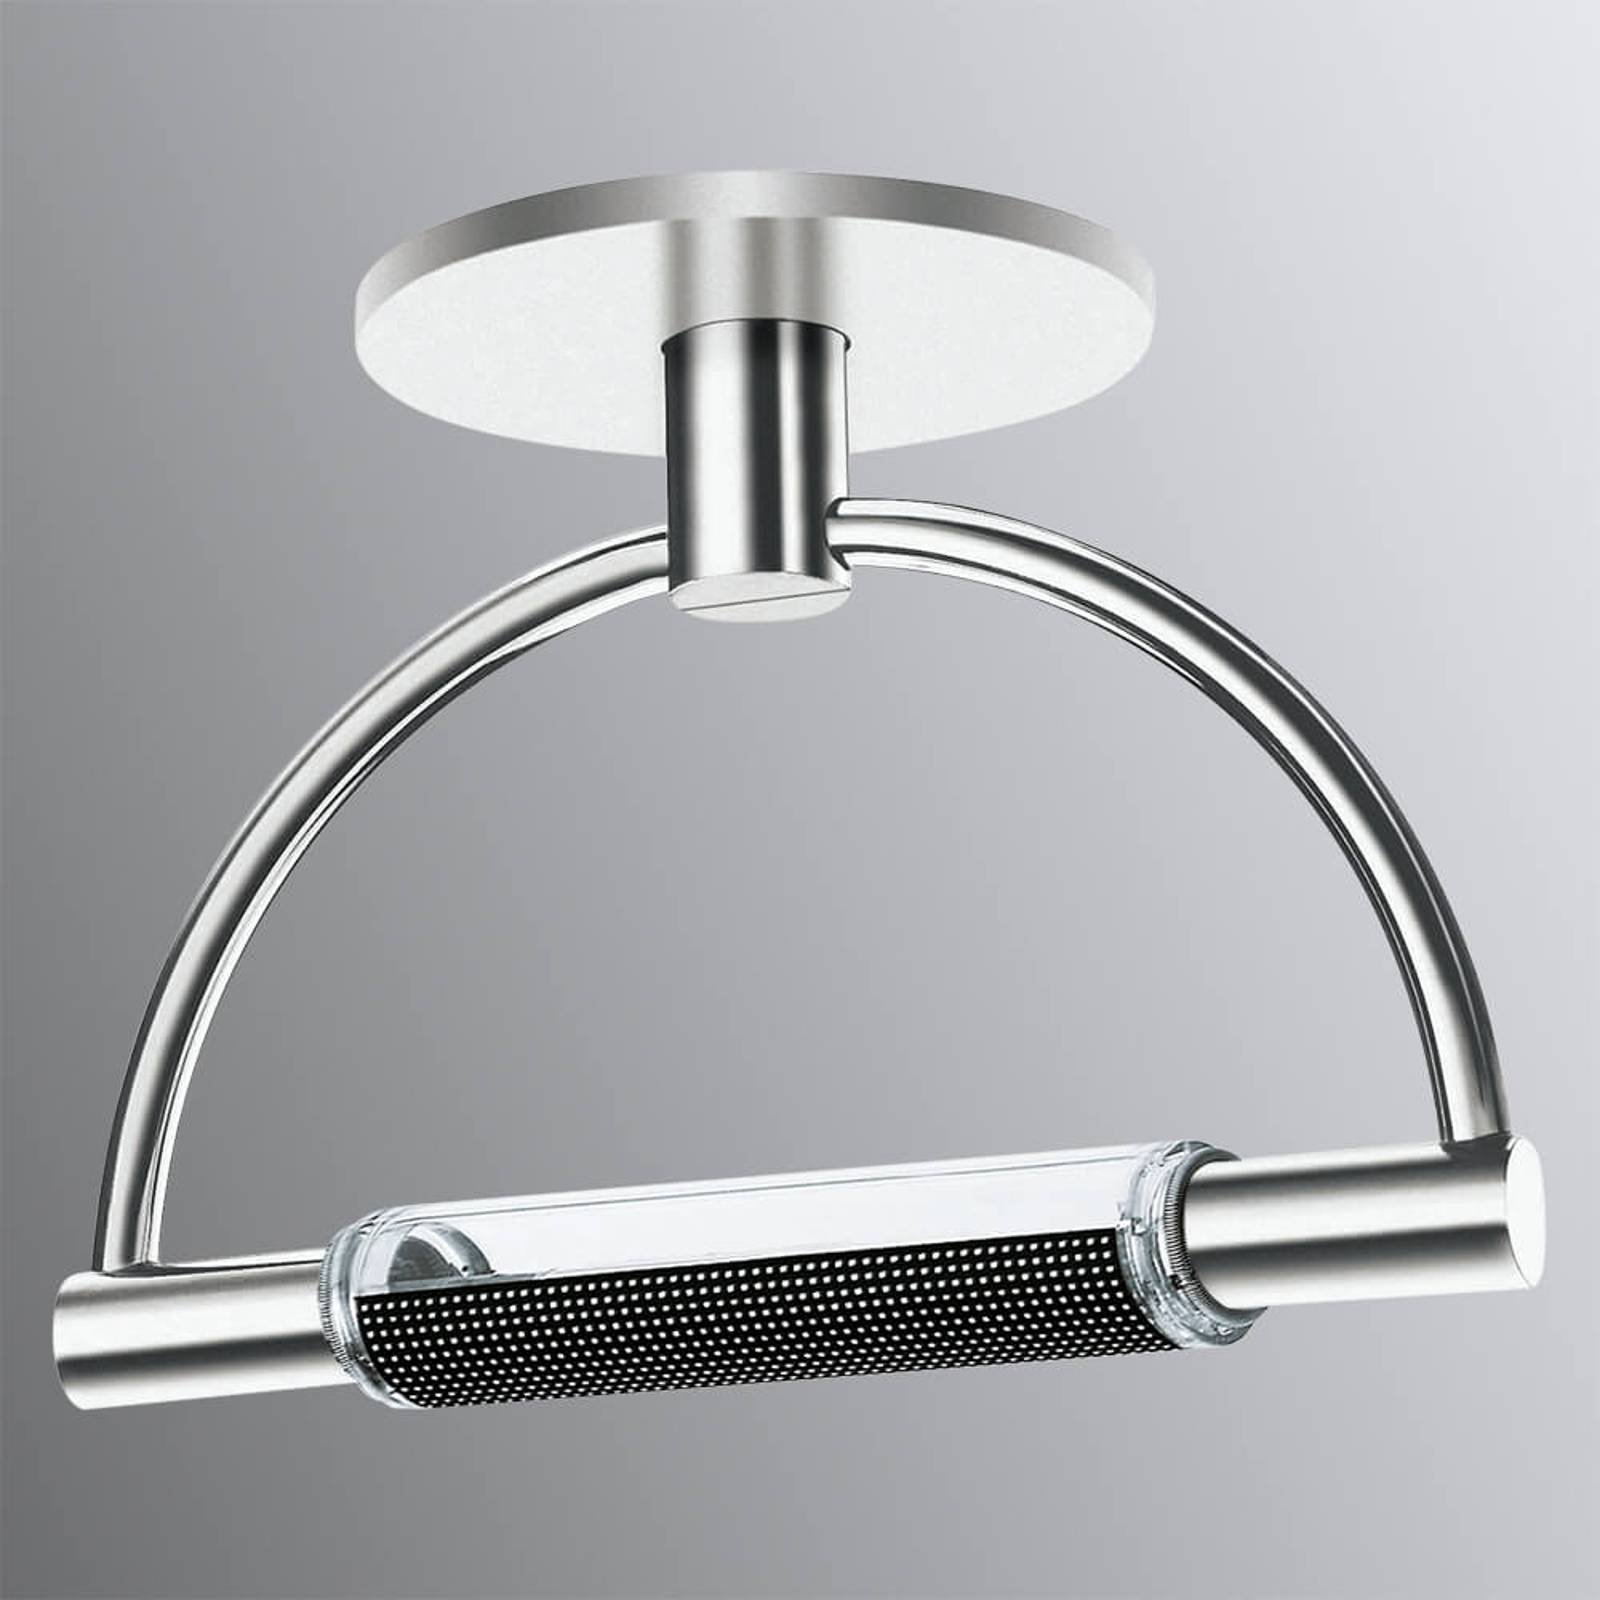 Cini&Gradi - LED-taklampe med kromfinish